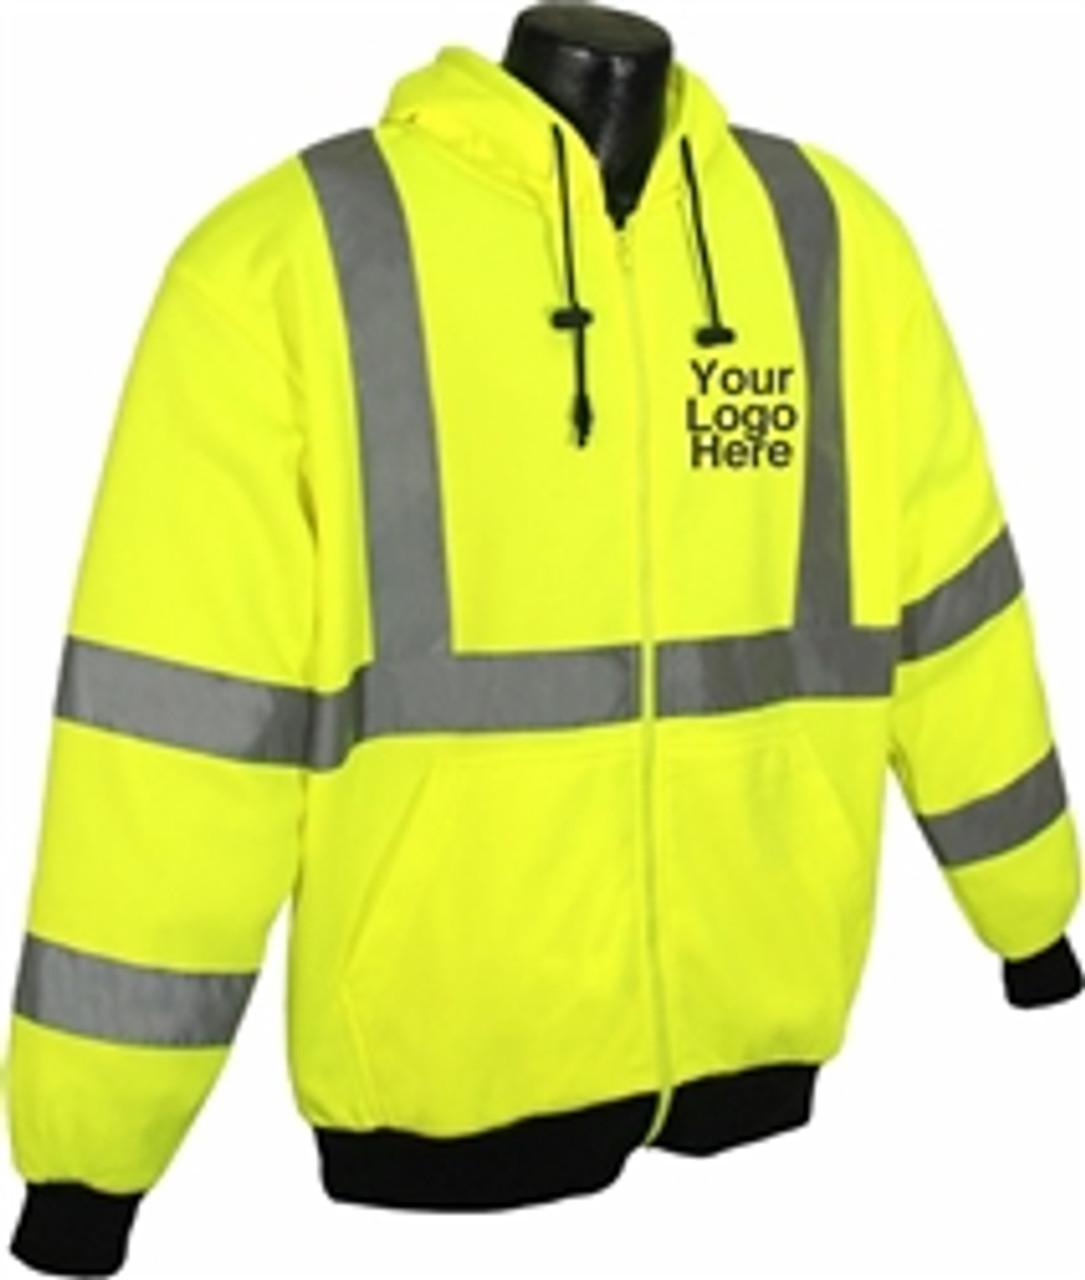 Class 3 Long Sleeve Hooded Sweatshirt *Custom Printing Available*